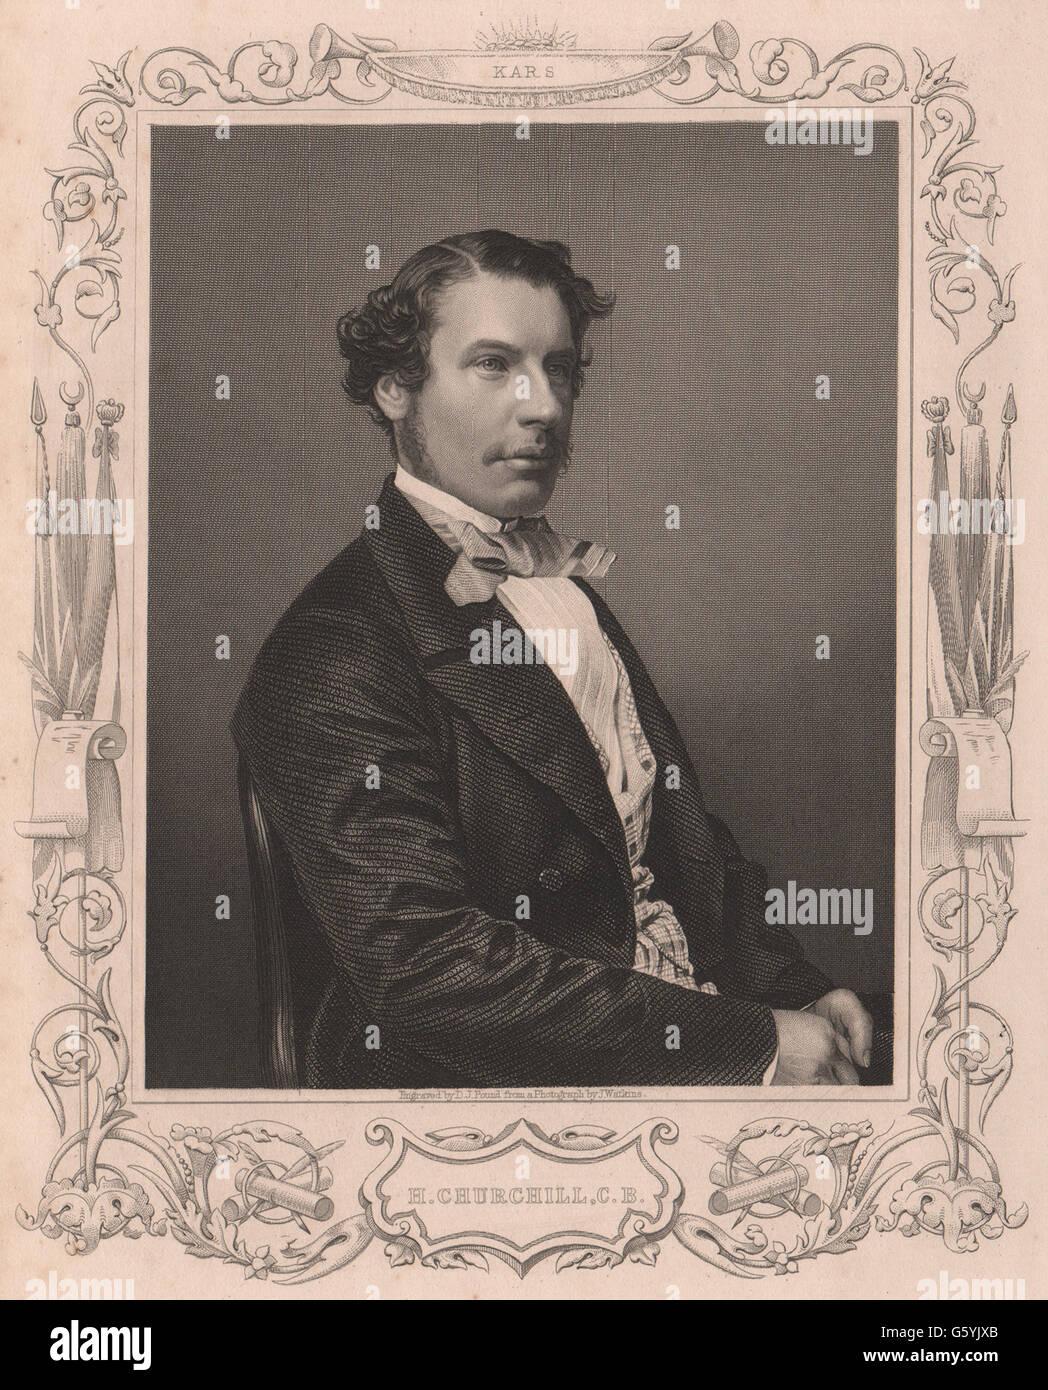 CRIMEAN WAR: Henry Adrian Churchill. C. B. Kars, antique print 1860Stock Photo